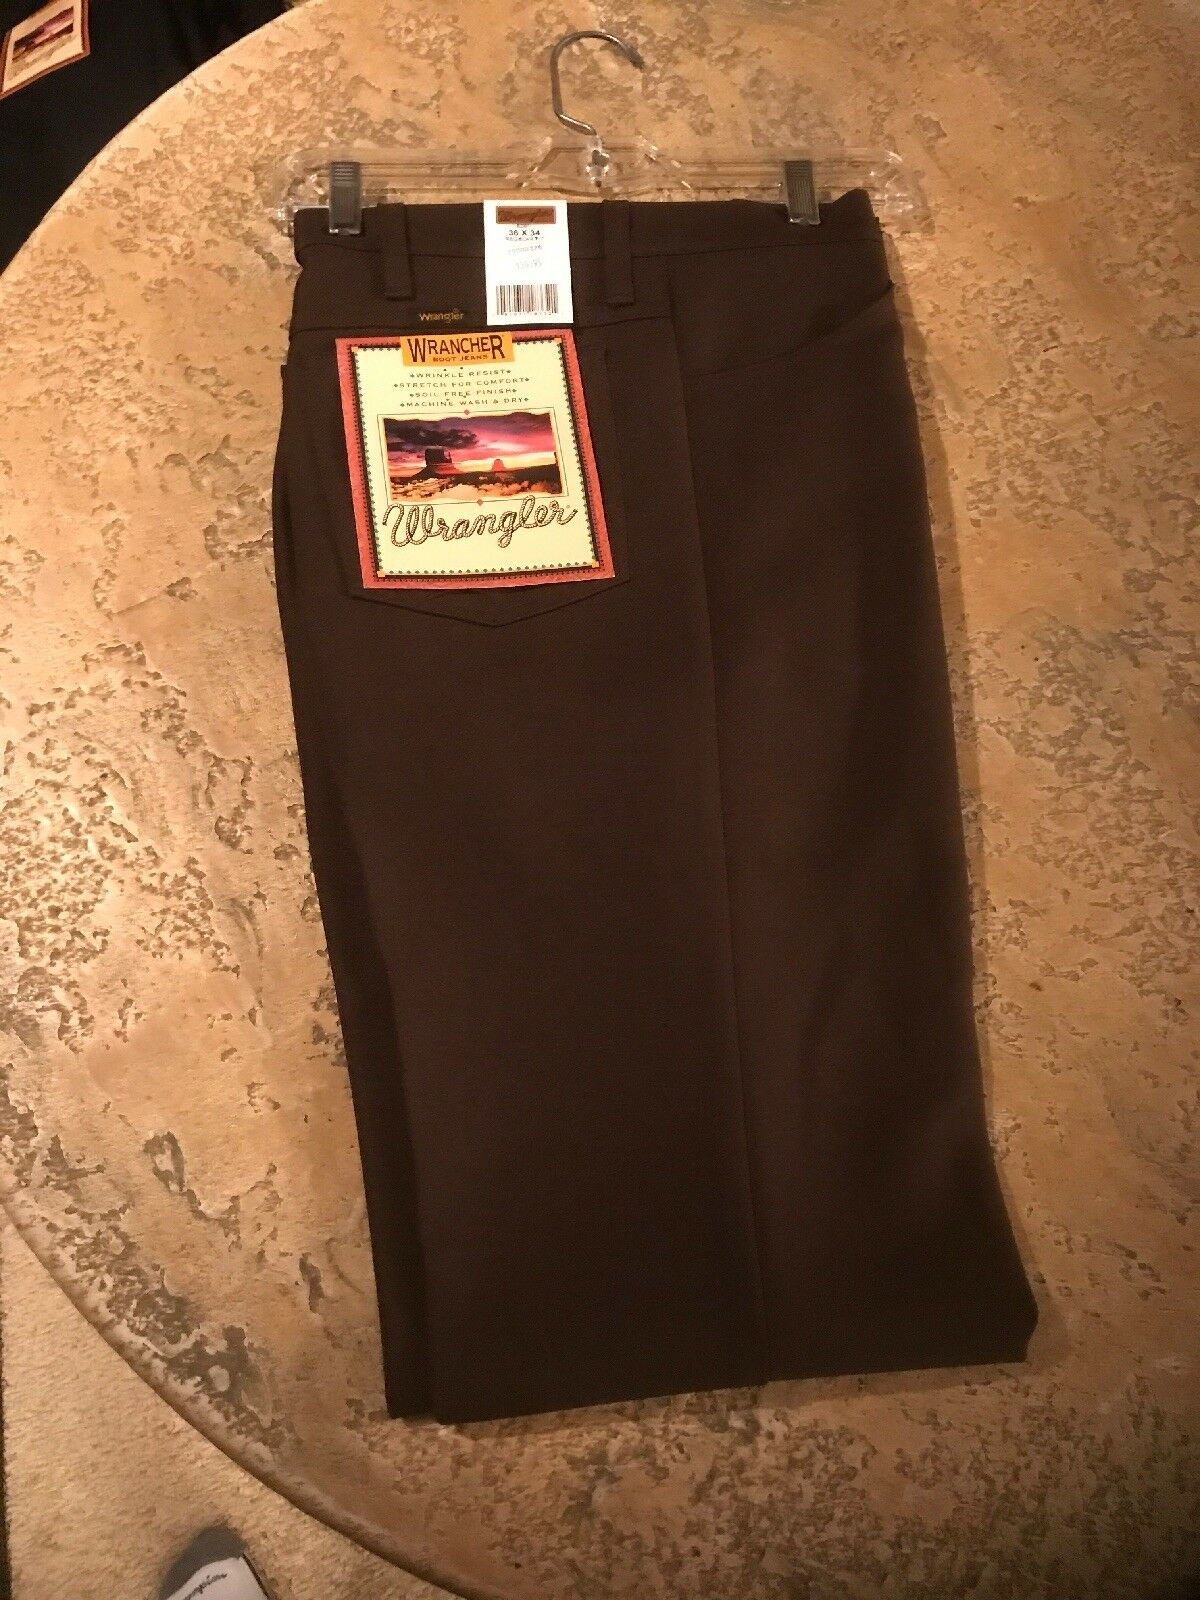 Wrangler USA Mens Brown Wrancher Polyester Pants Dress Jeans 82BN 36x34